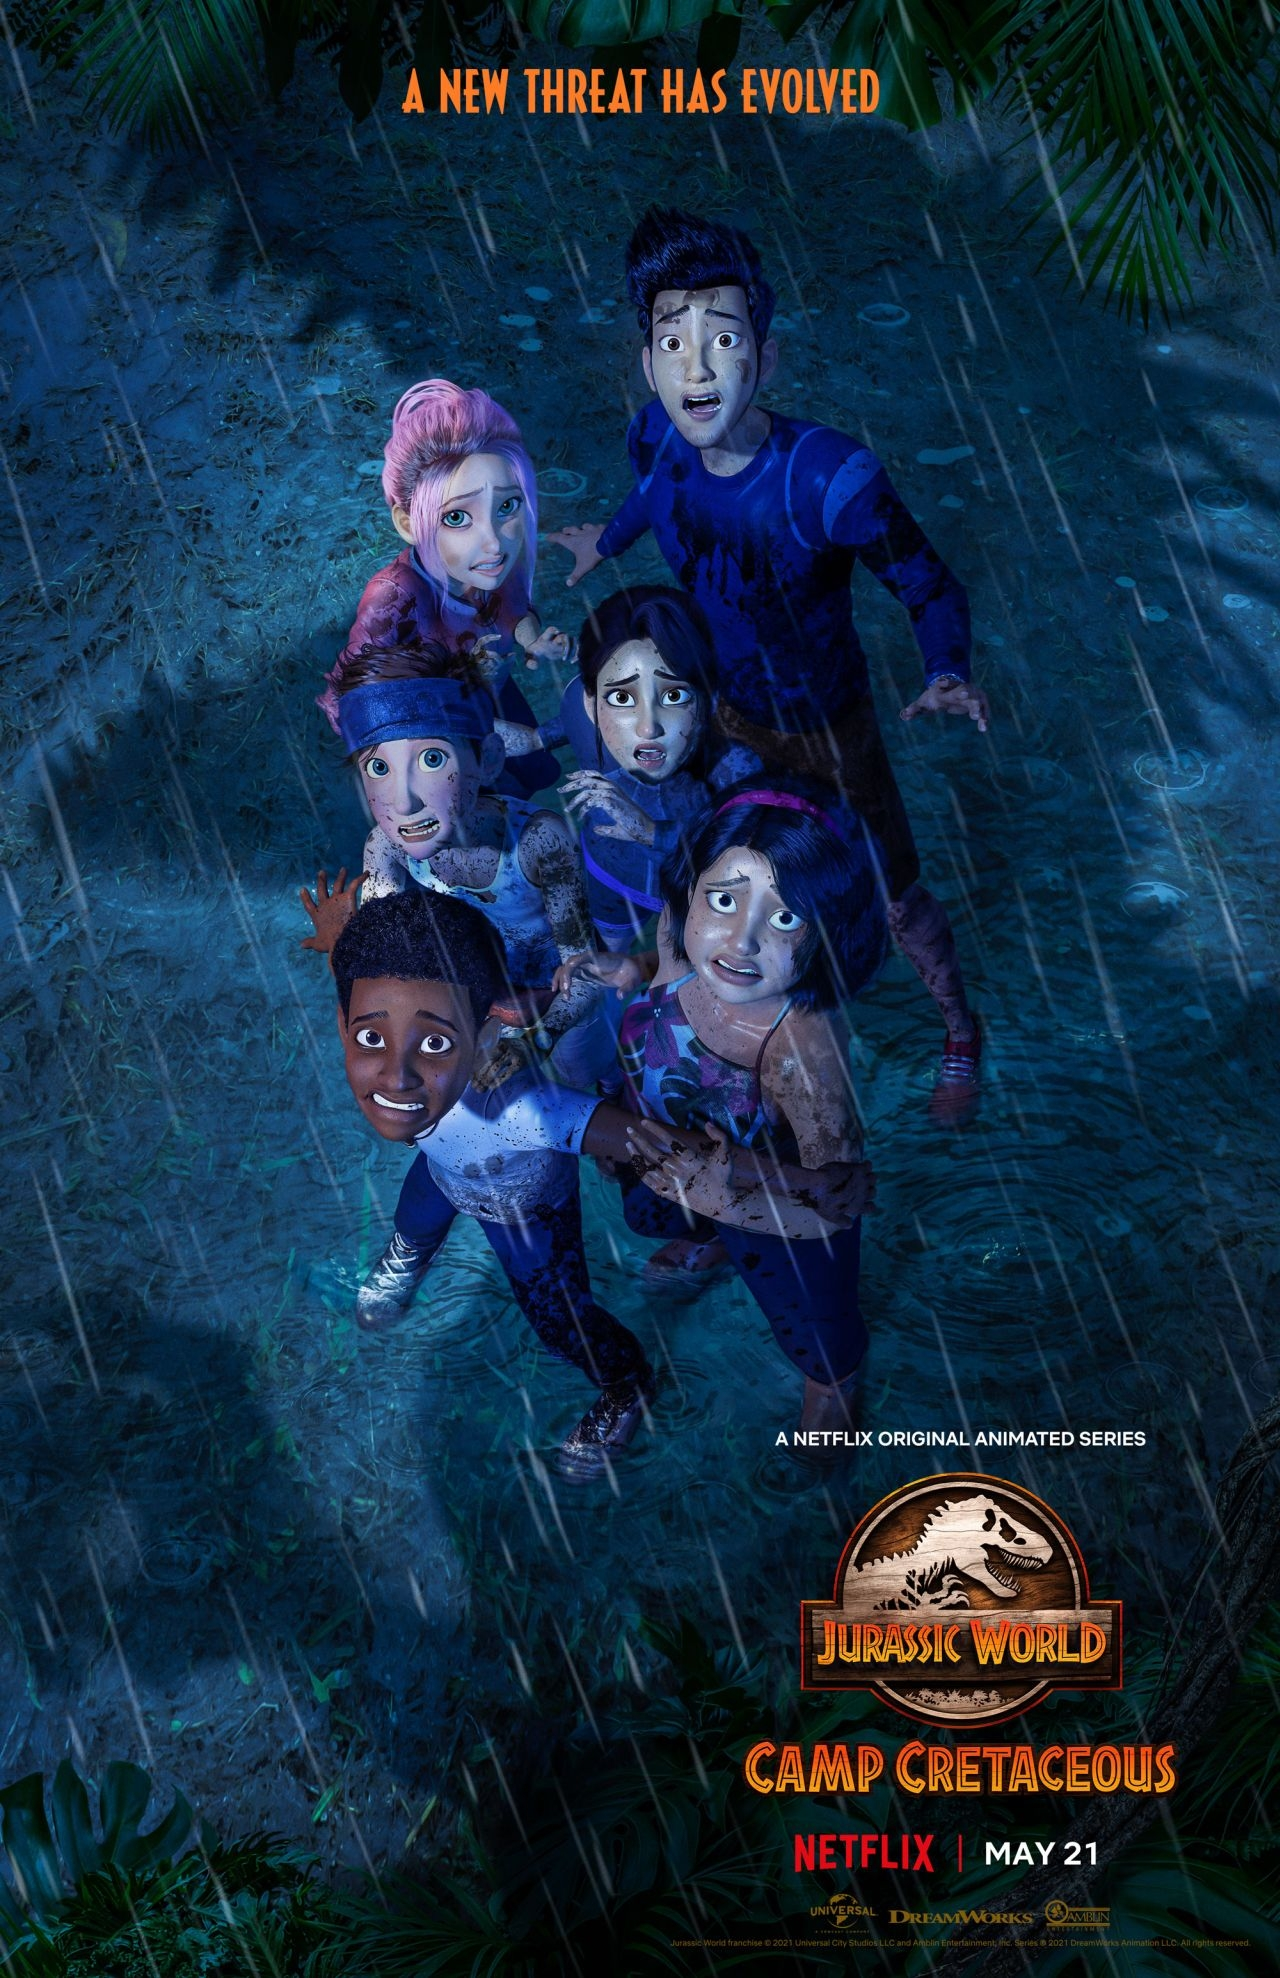 >Jurassic World Camp Cretaceous Season 3 จูราสสิค เวิลด์ ค่ายครีเทเชียส ปี3 พากย์ไทย